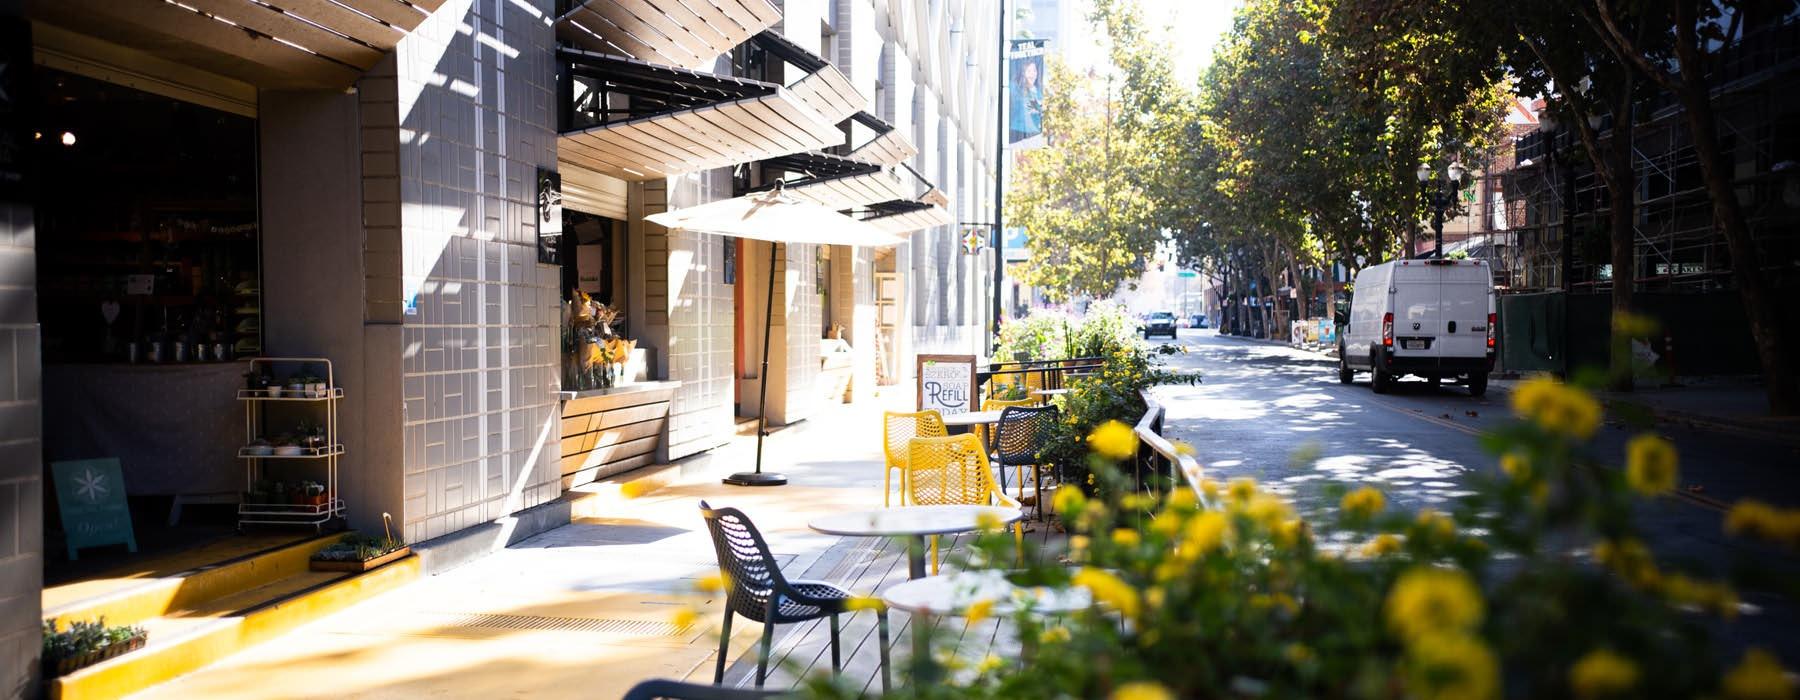 dining tables on sidewalk, in front of neighborhood restaurant